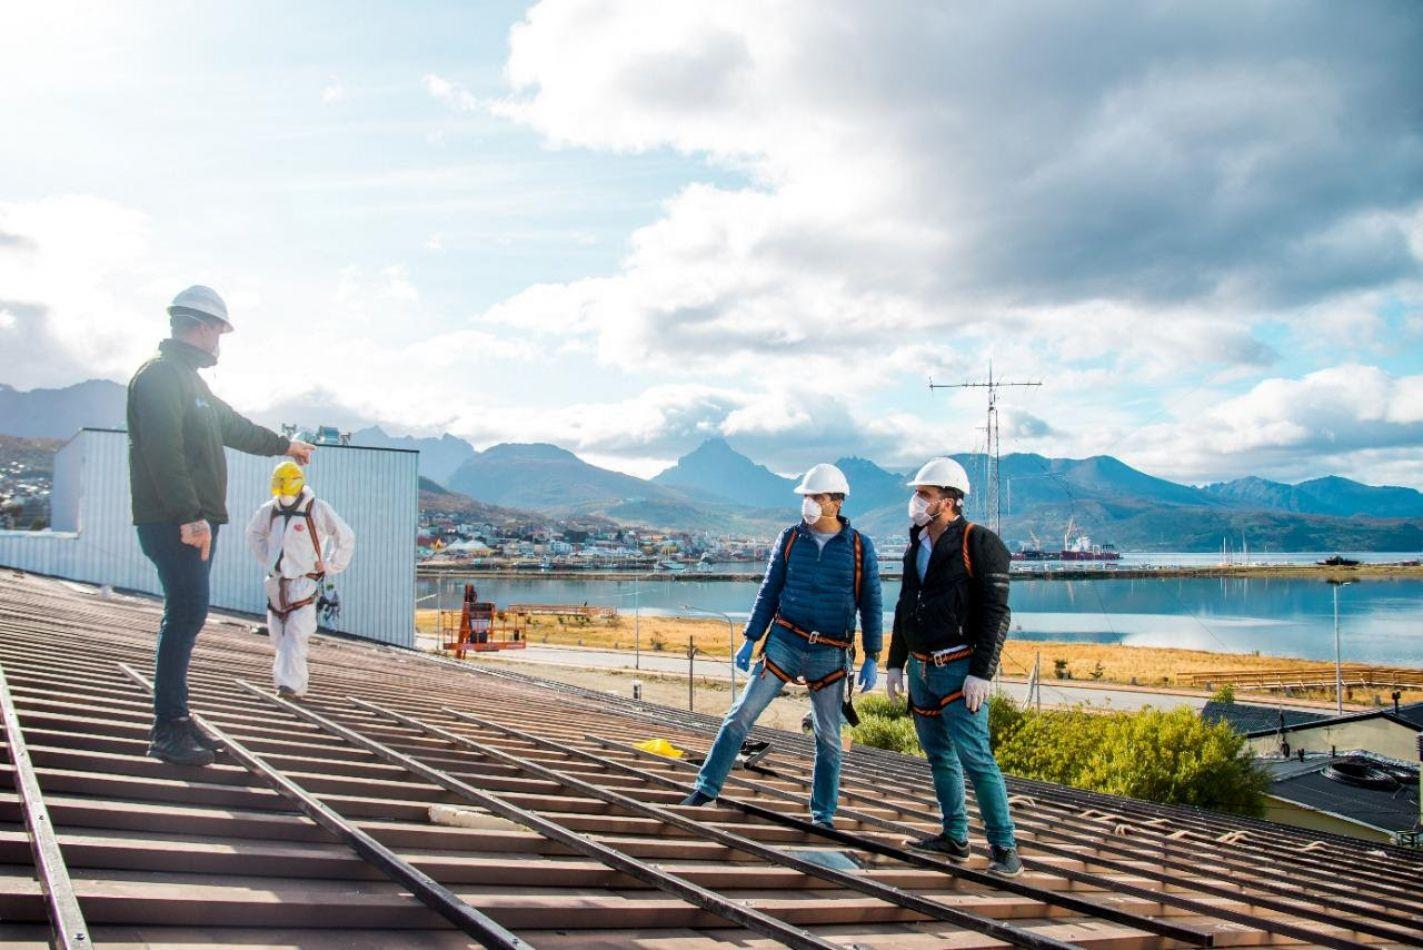 l intendente de Ushuaia Walter Vuoto recorrió las obras que se realizan en el Albergue Municipal.